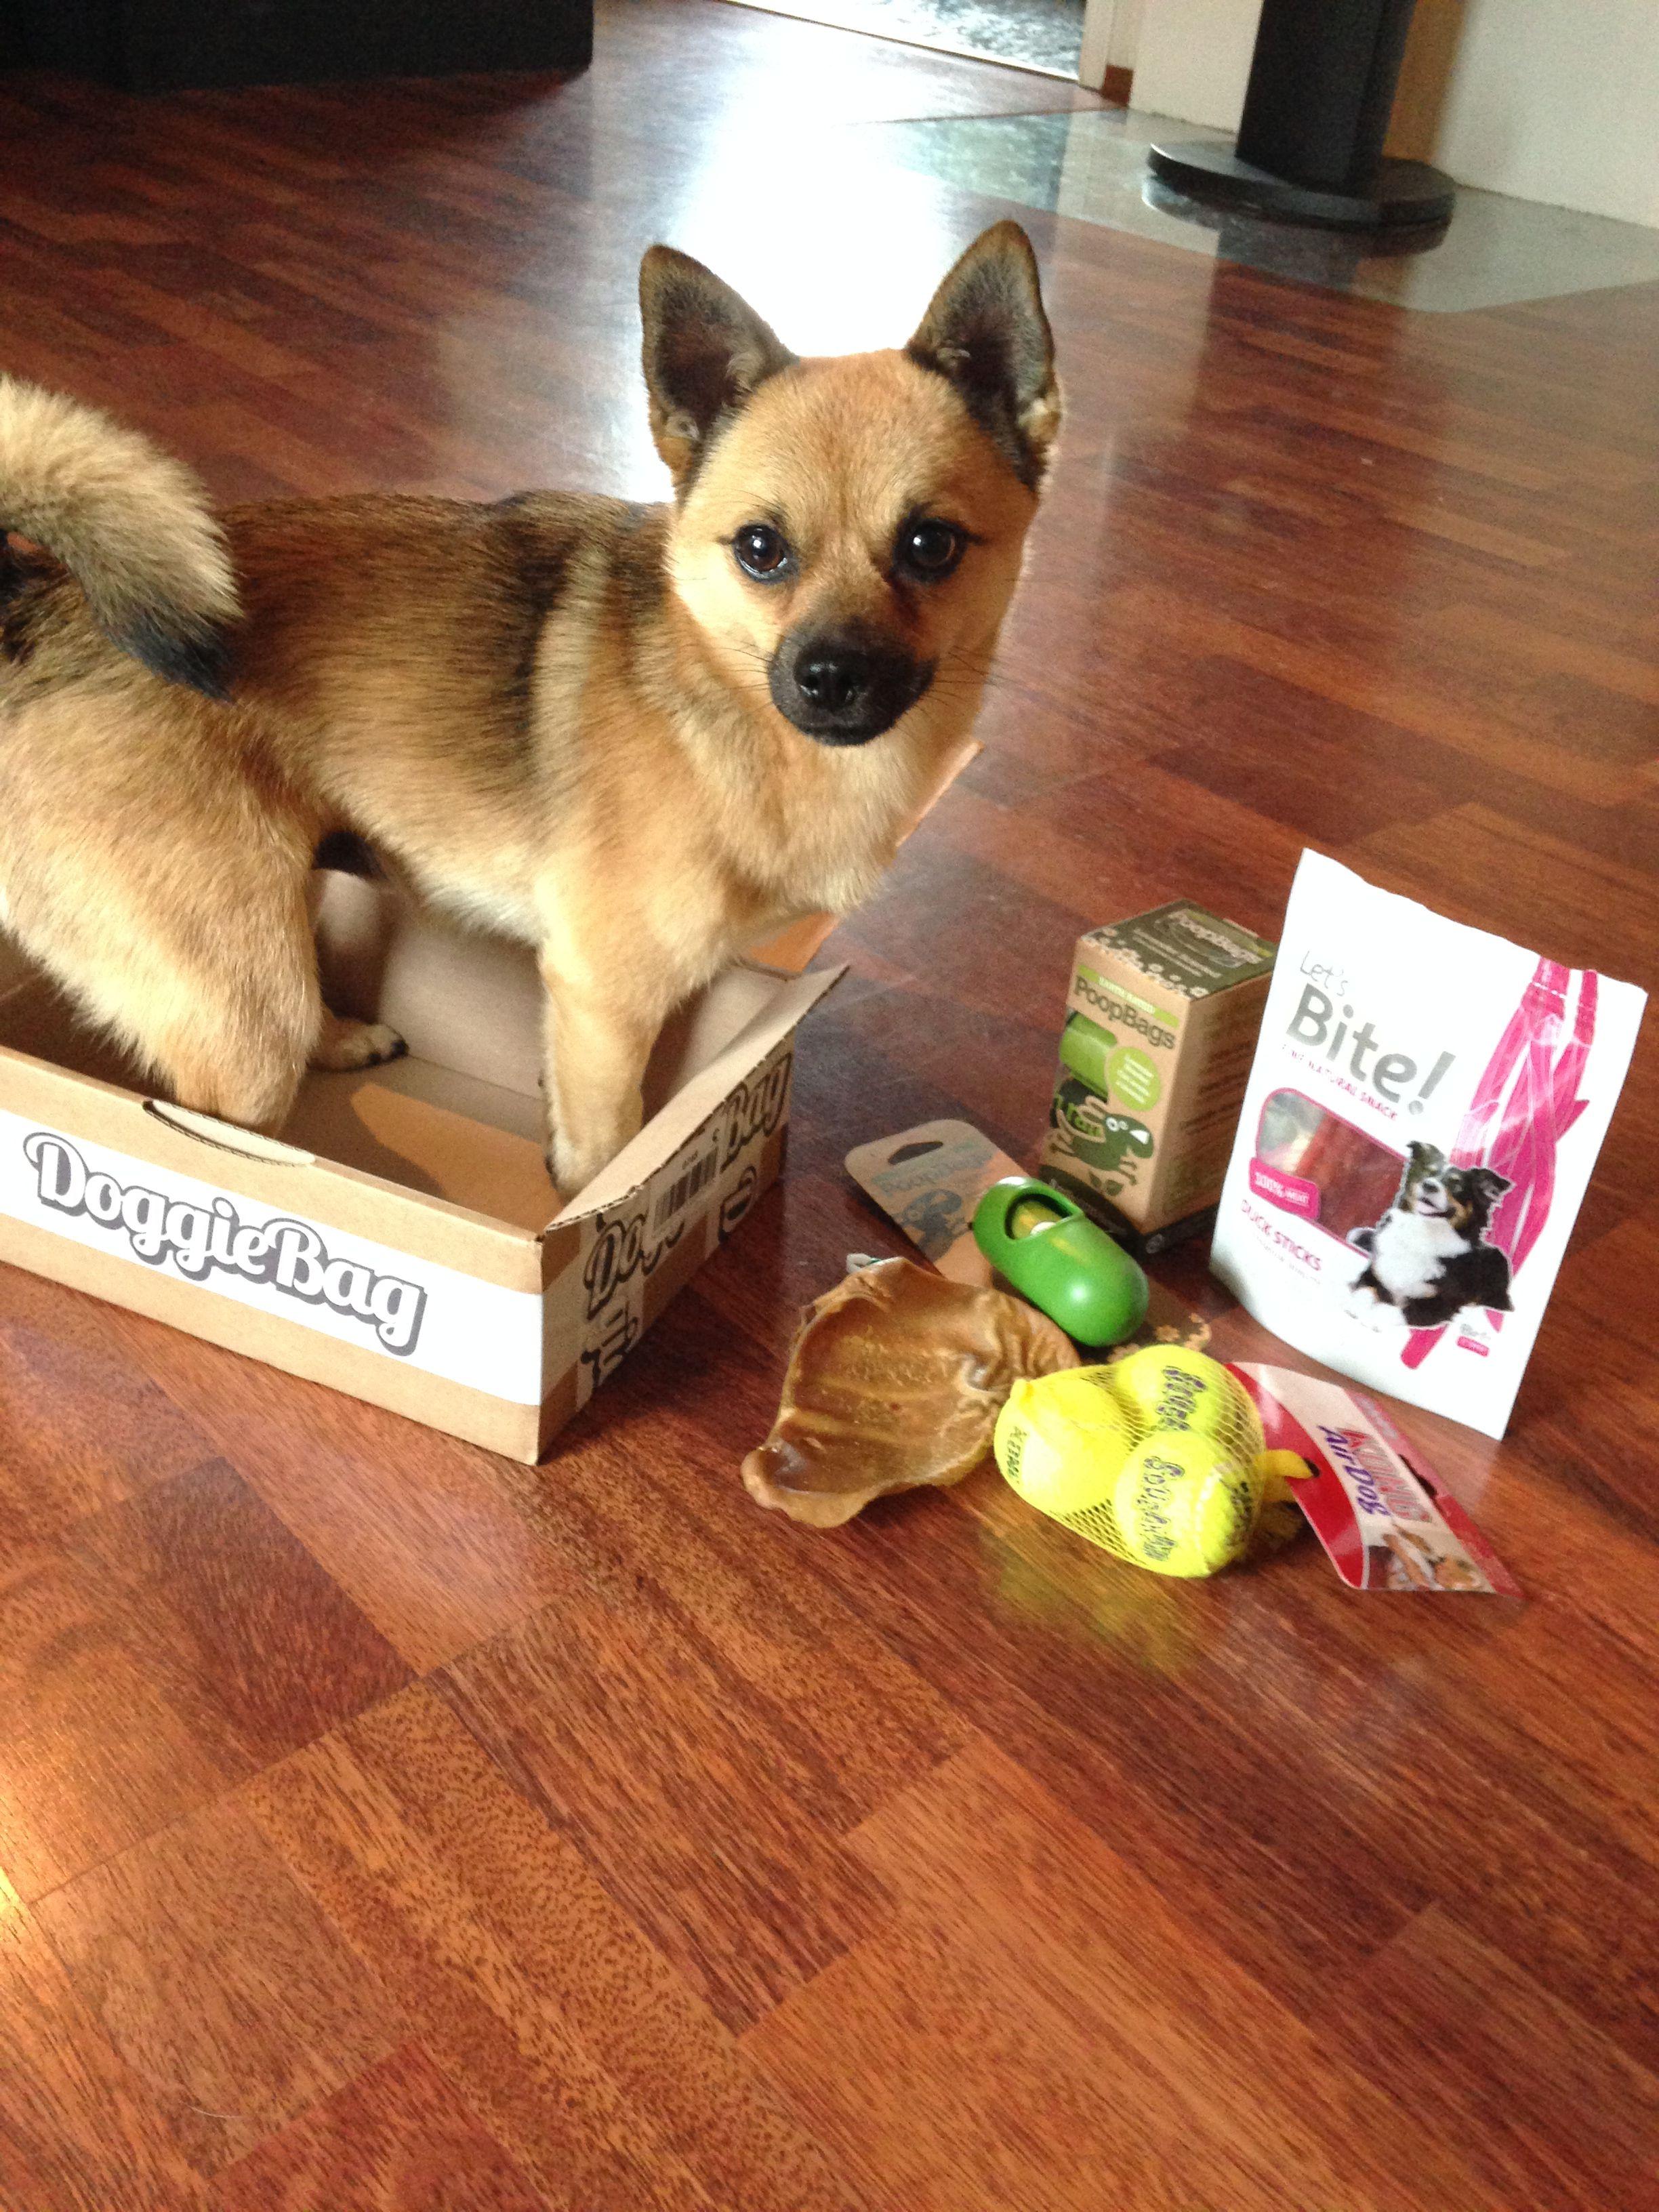 Rambo - DoggieBag.no #DoggieBag #Hund